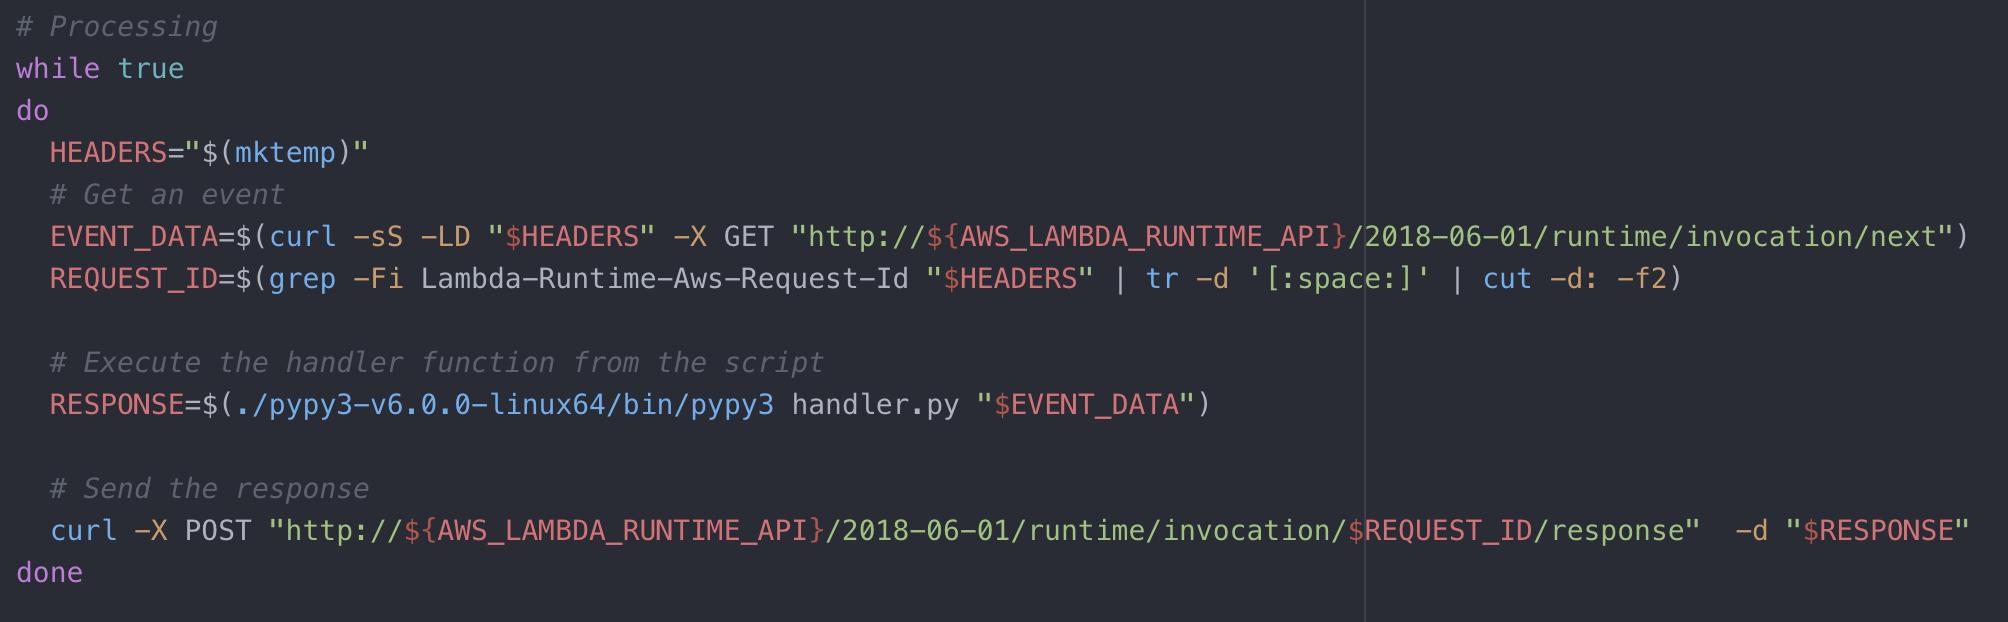 aws lambda runtime